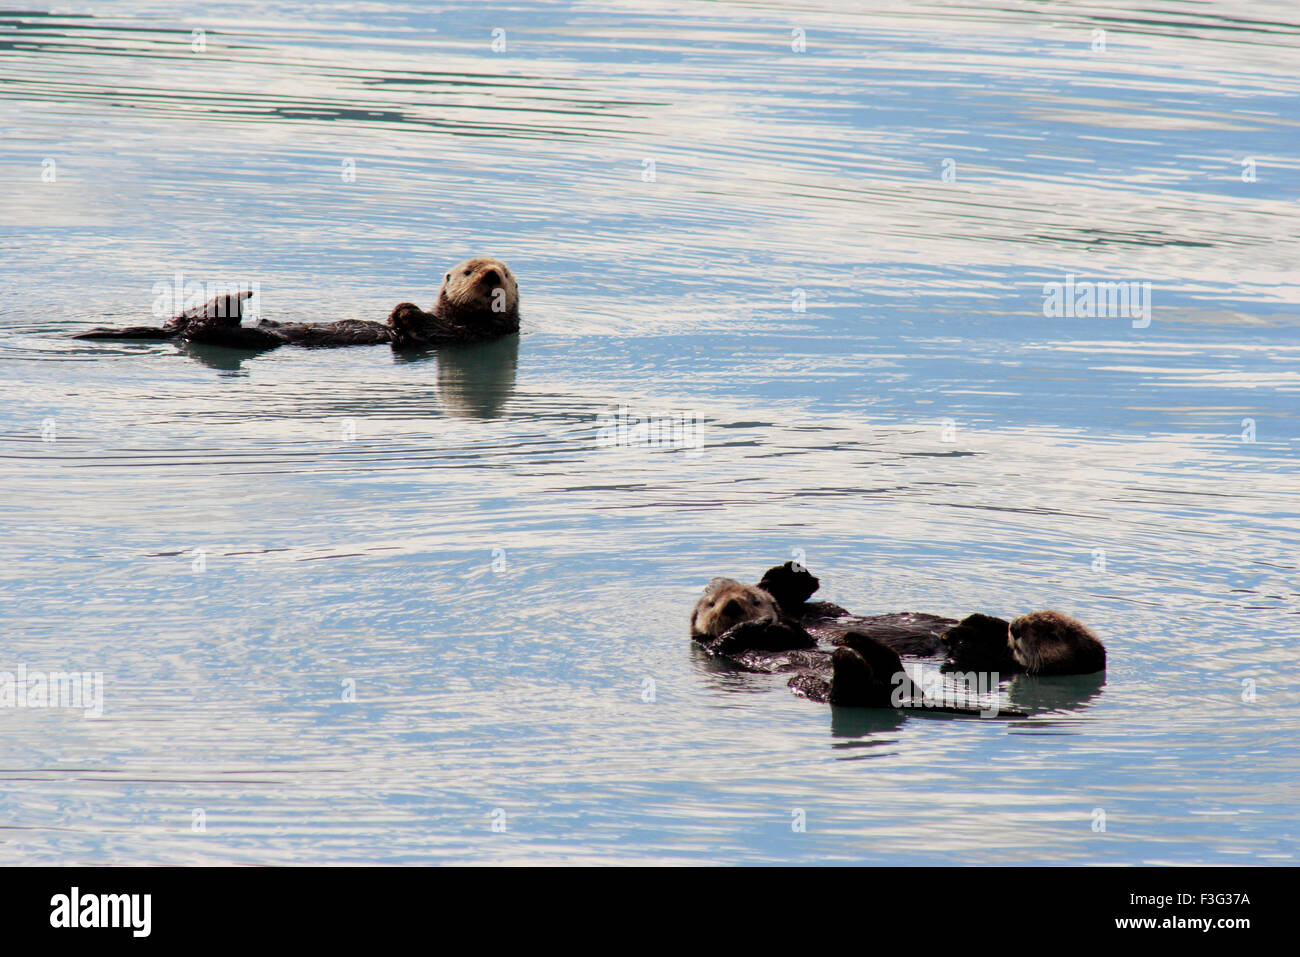 Sea otters floating in resurrection bay ; Seward ; Kenai peninsula borough ; Alaska ; U.S.A. - Stock Image